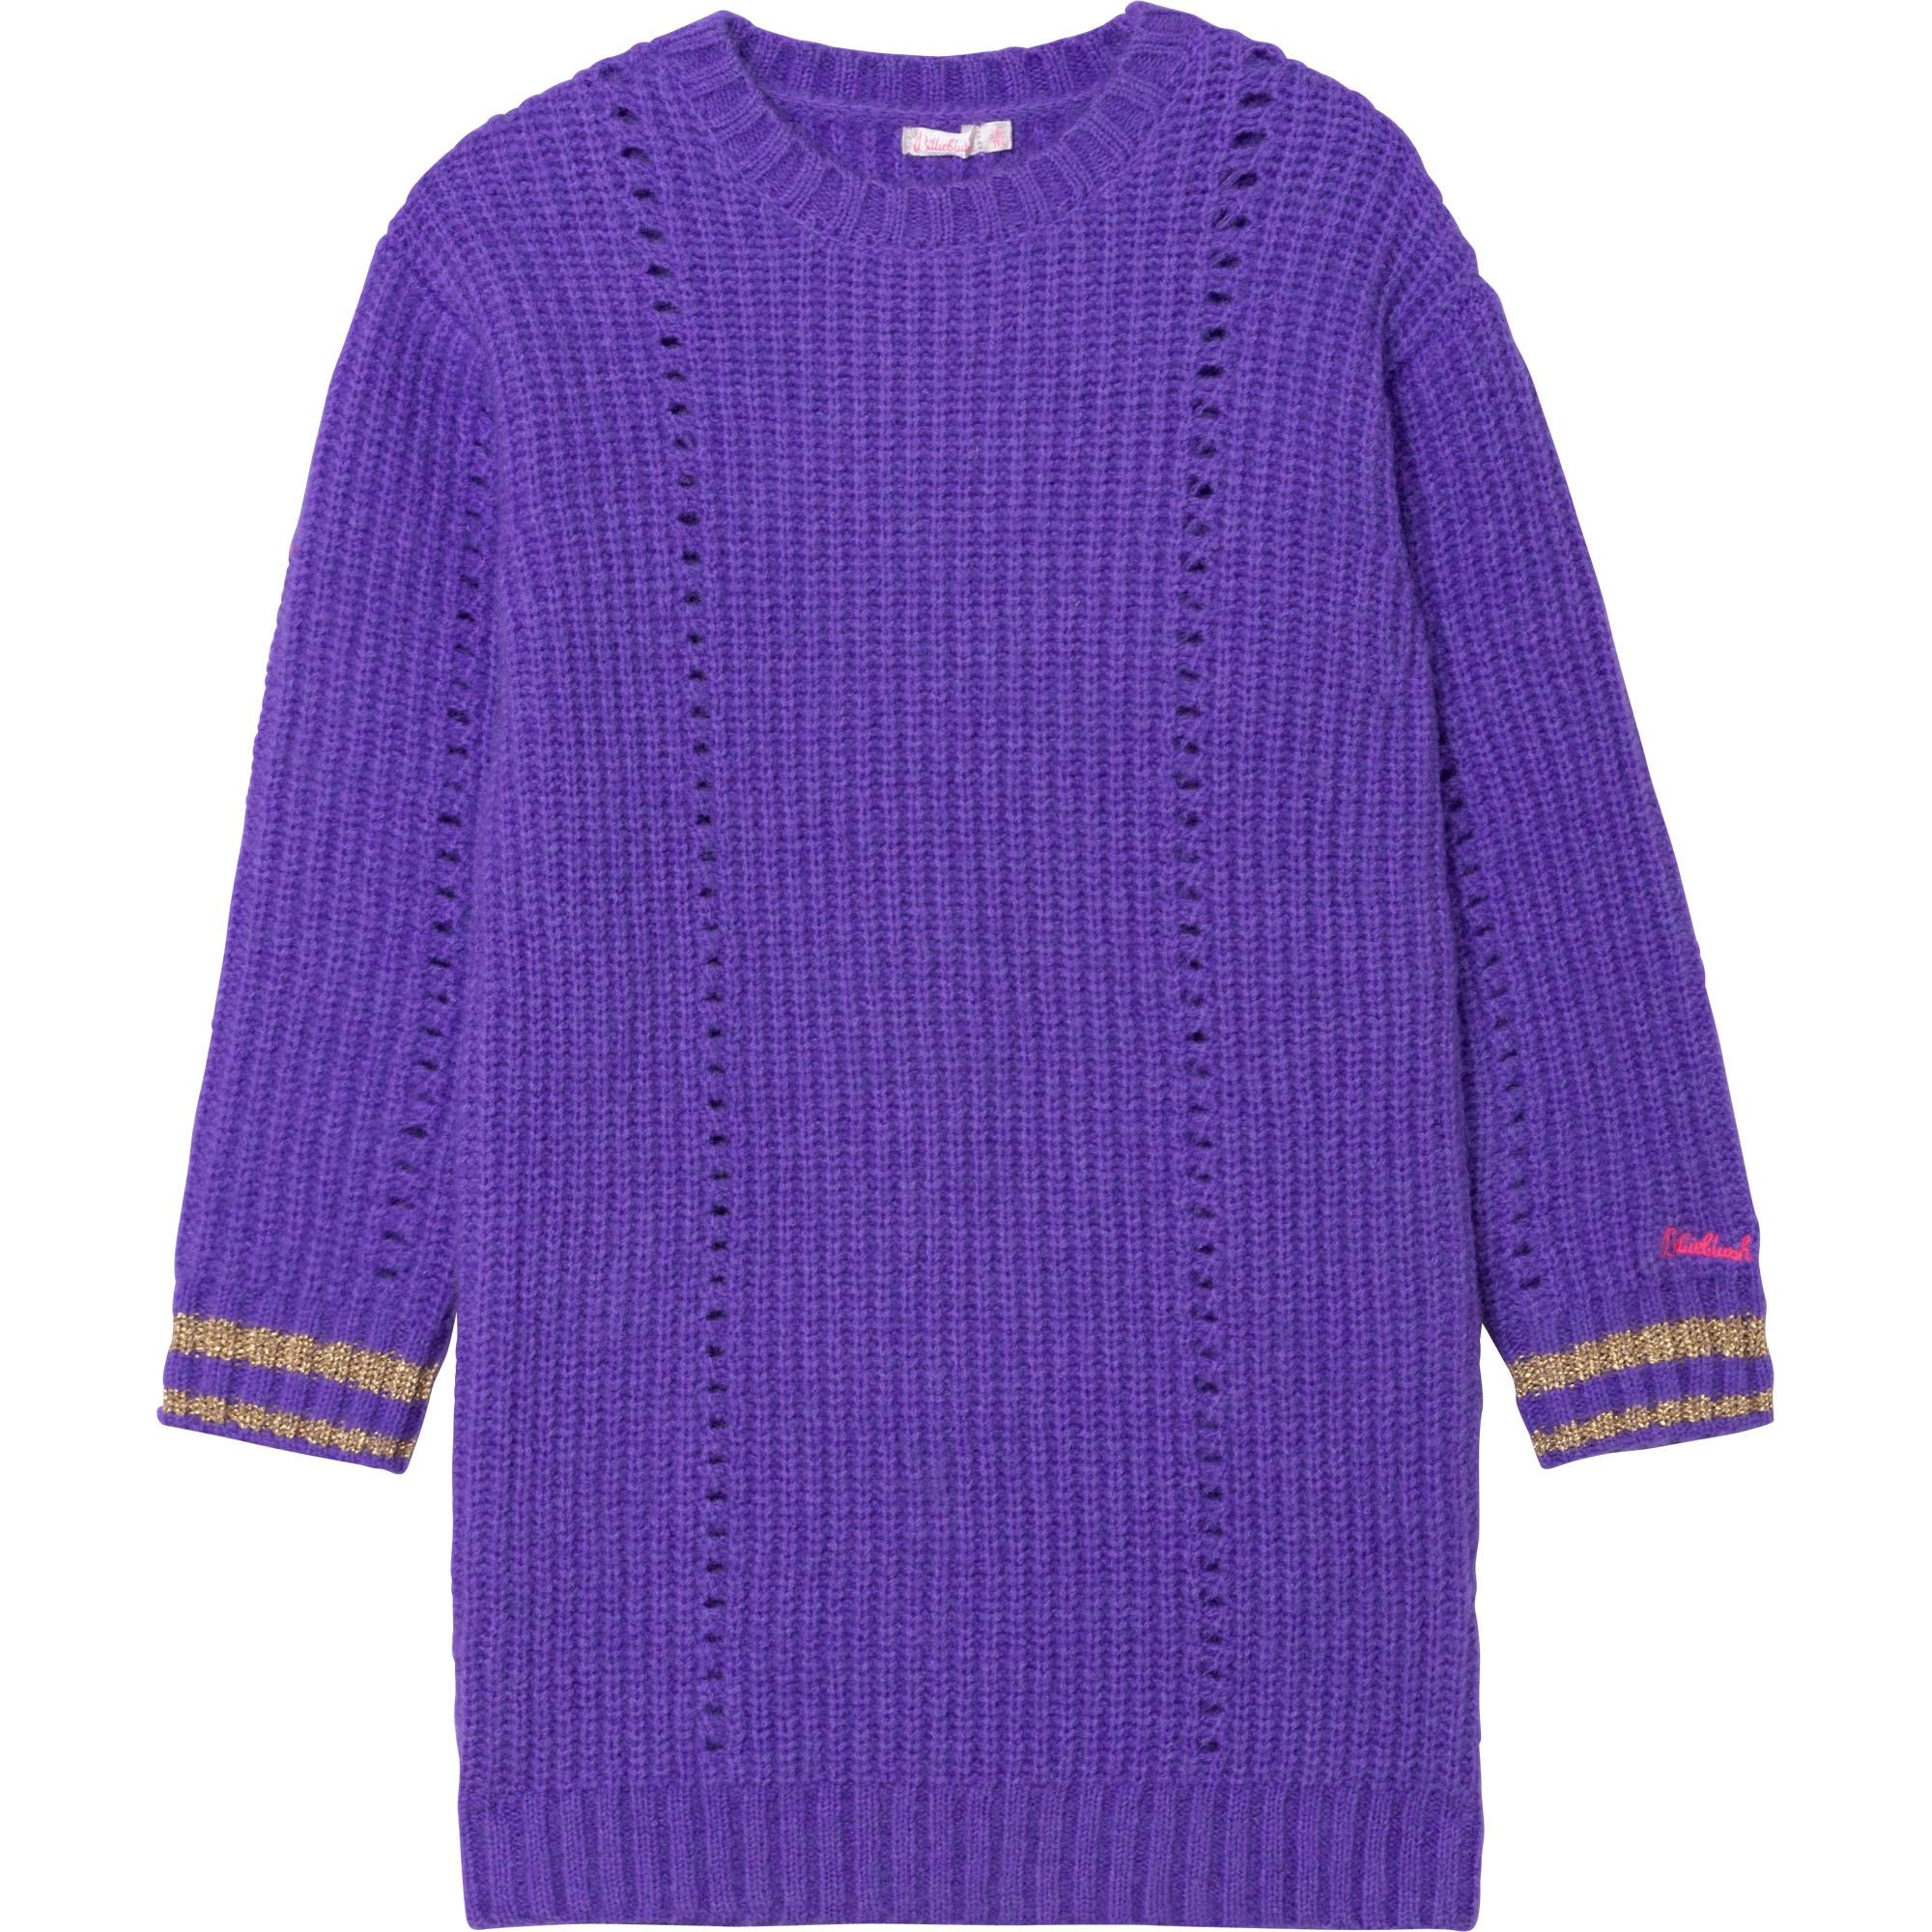 Openwork knit sweater dress BILLIEBLUSH for GIRL